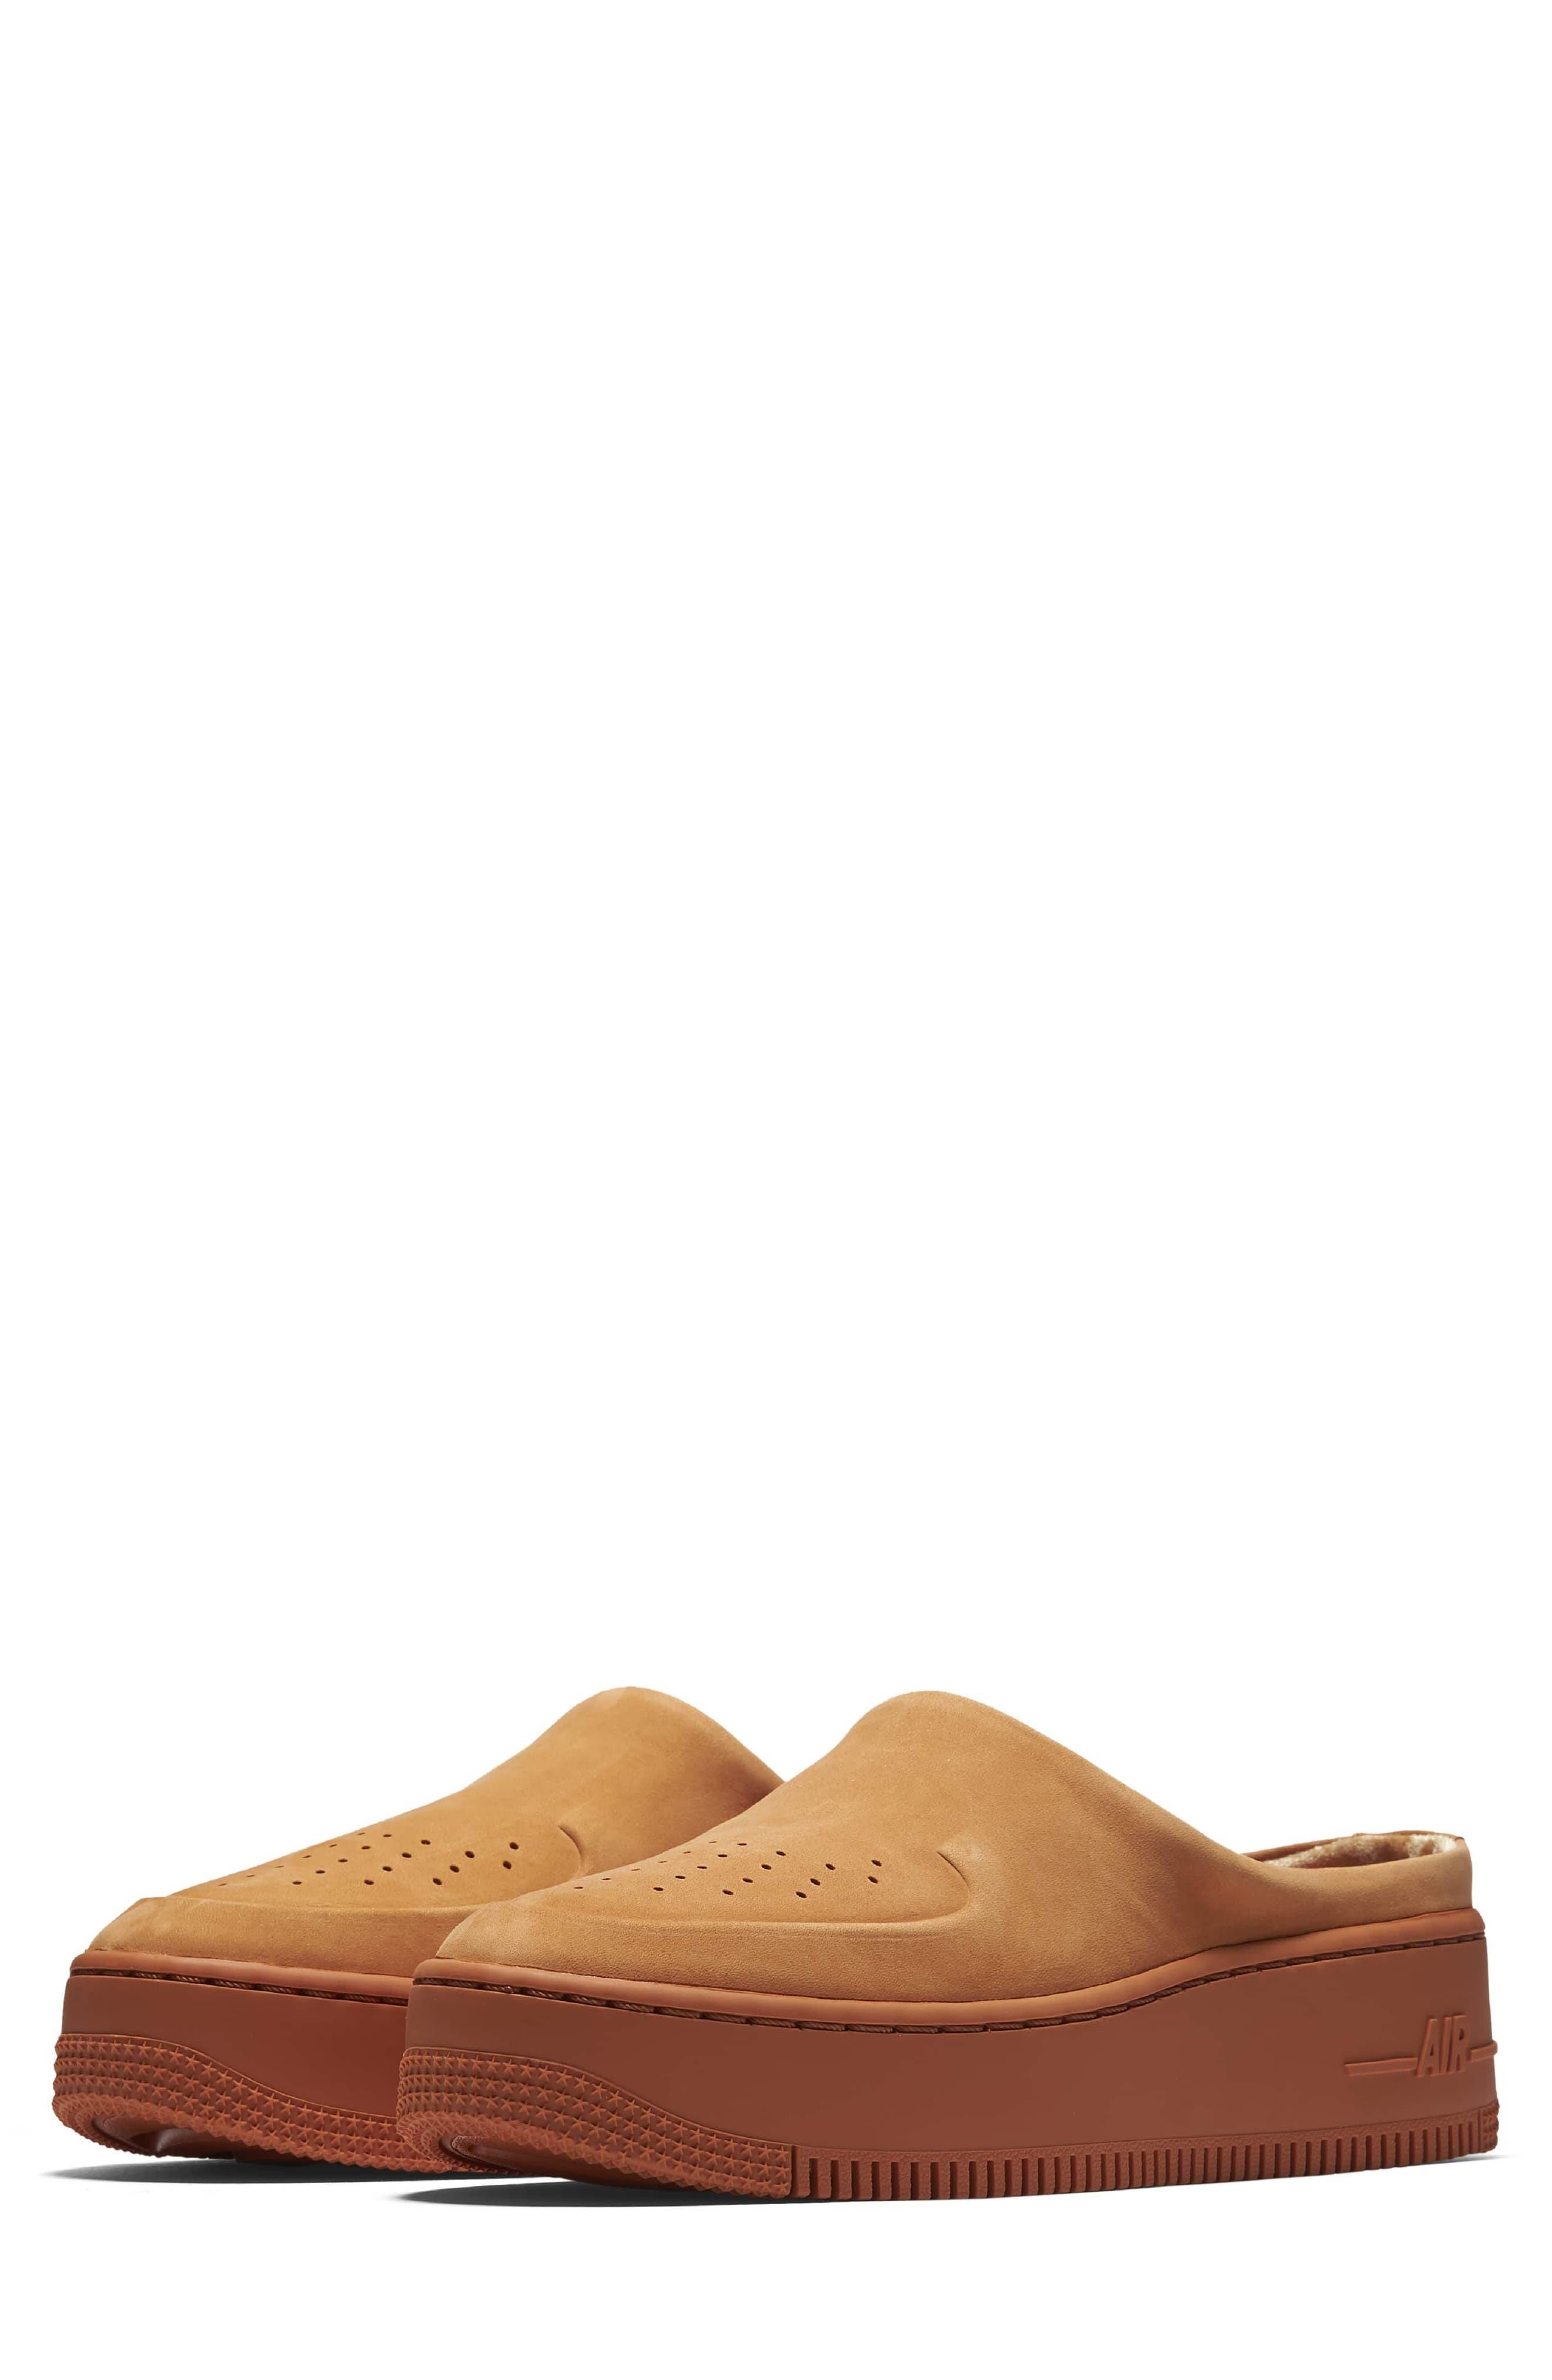 Air Force 1 Lover XX Slip-On Mule Sneaker,                             Main thumbnail 1, color,                             Cinder Orange